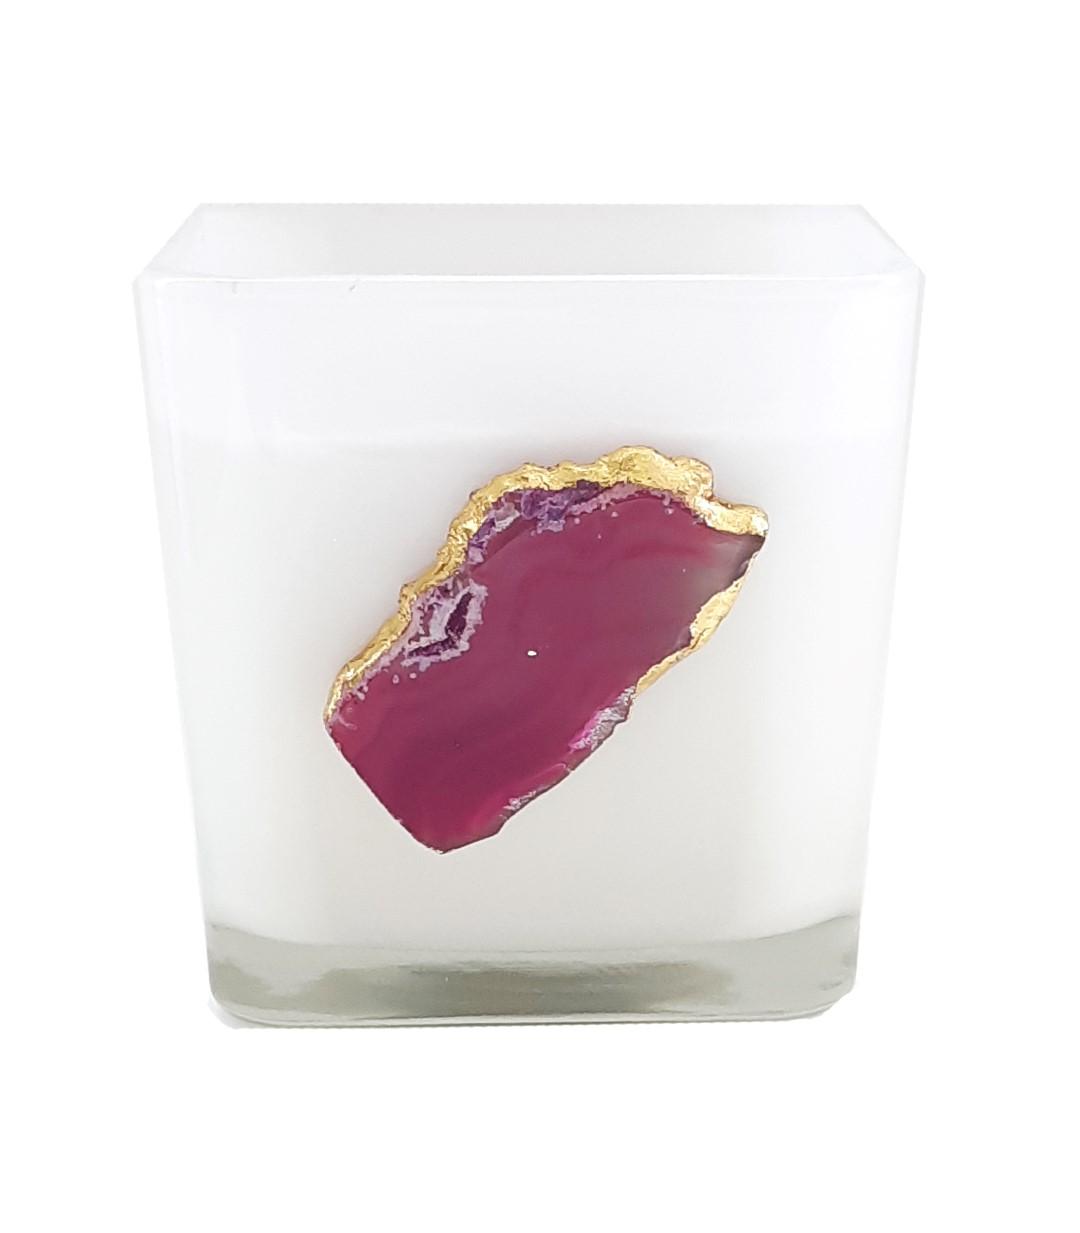 נר בכלי מרובע עם אבן ברקת - Violet Quartz